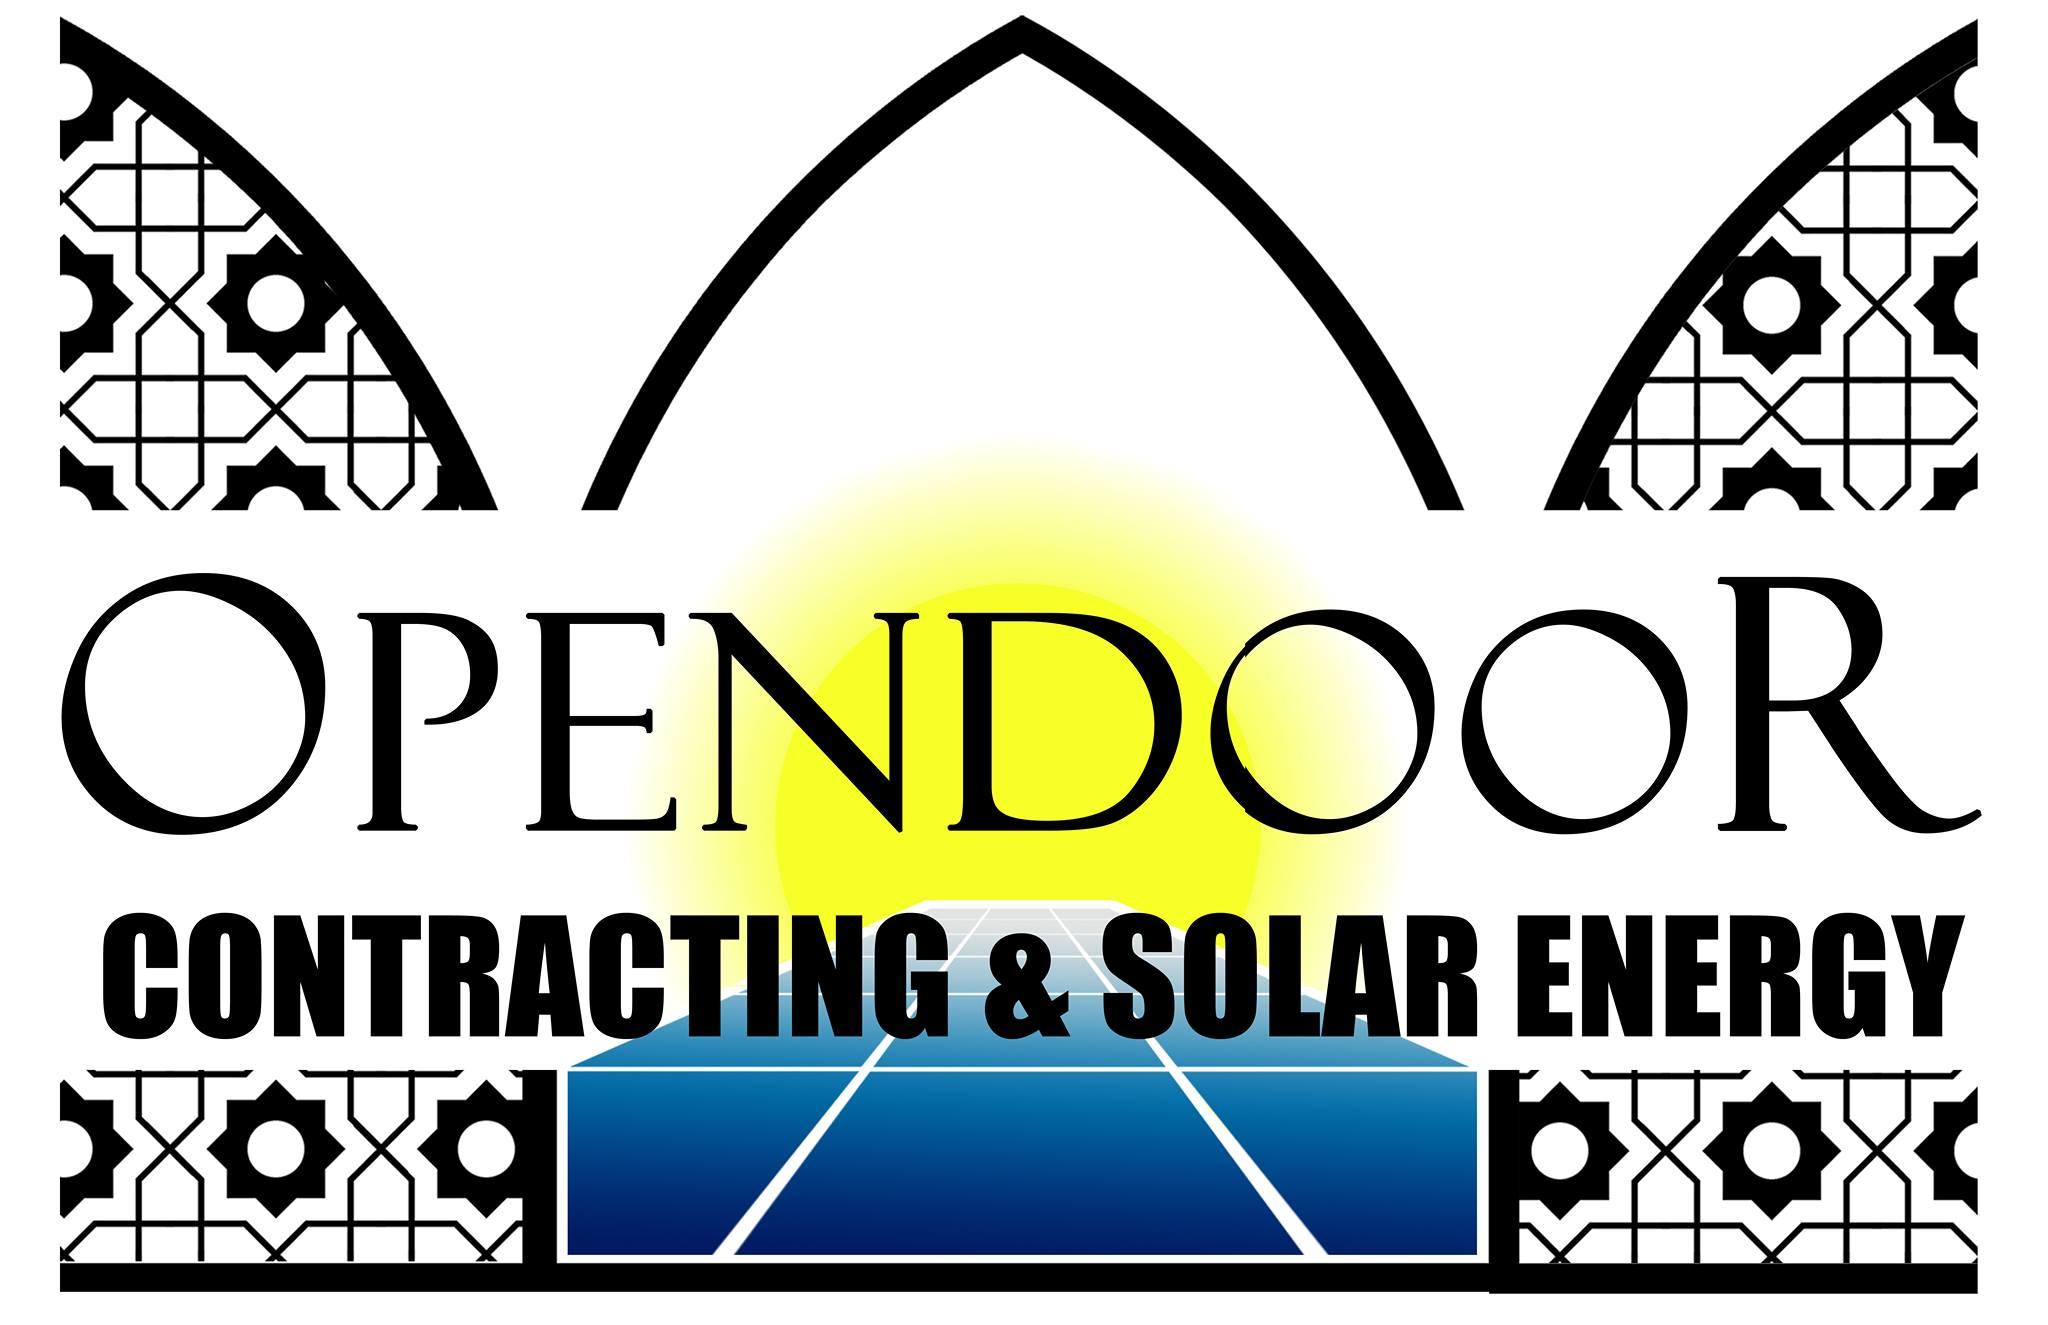 OPEN DOOR للطاقه الشمسيه